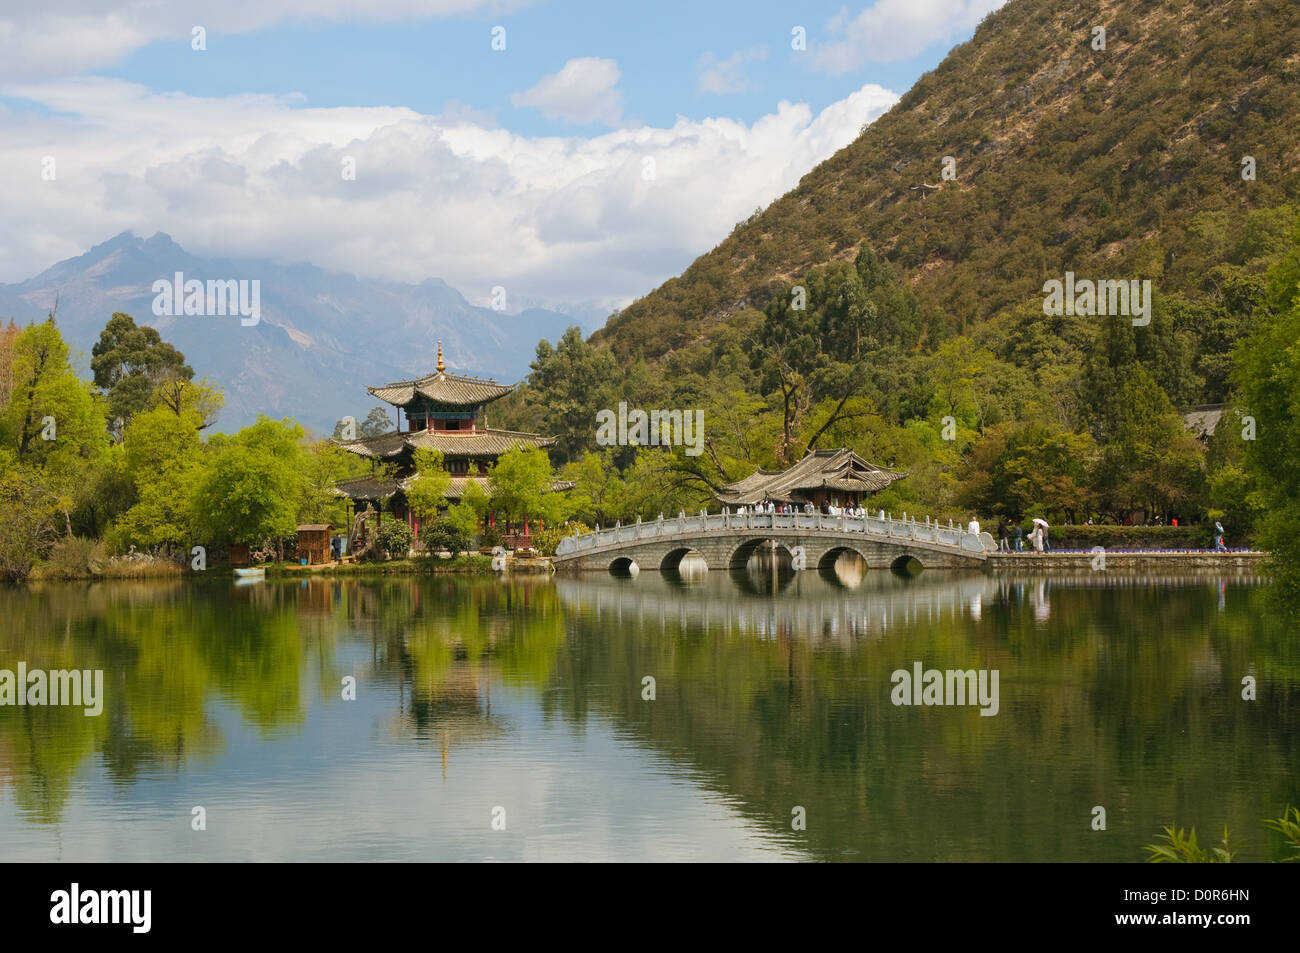 Black dragon pool, Lijiang, China - Stock Image